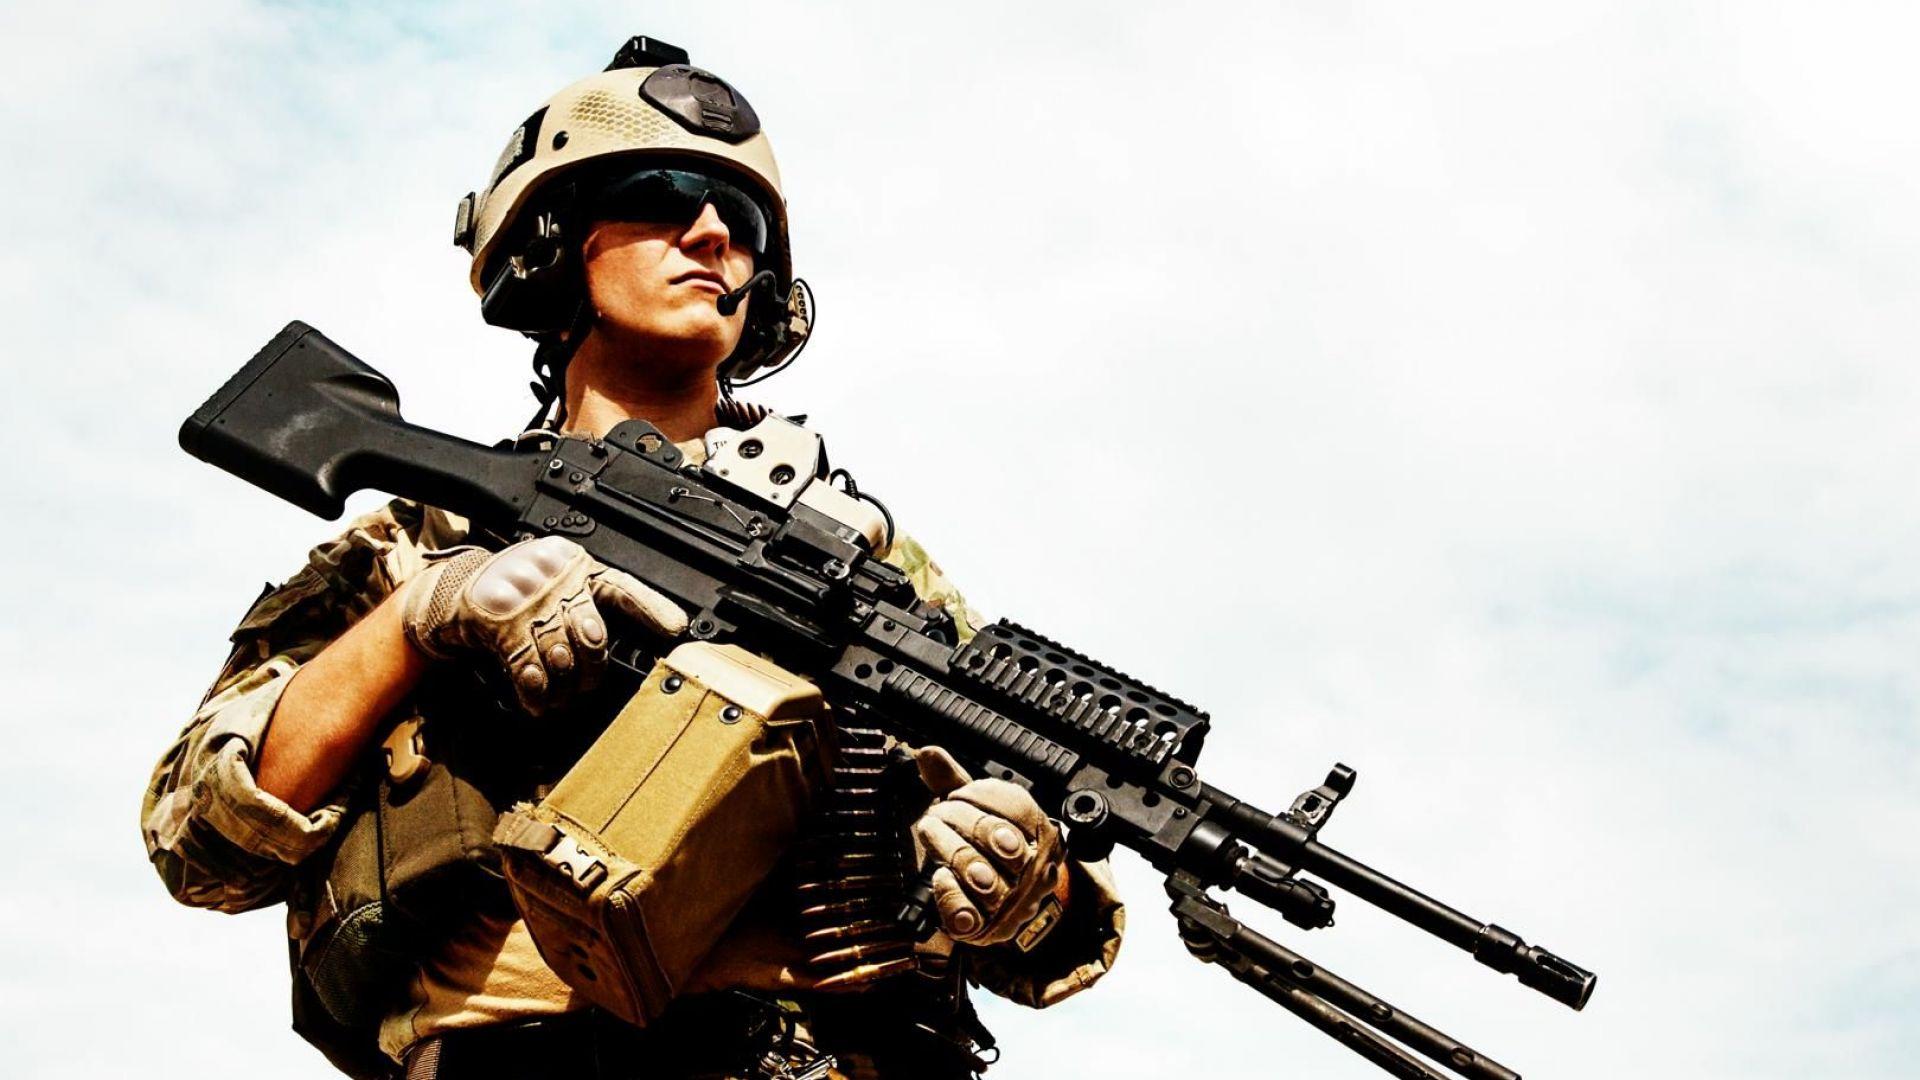 Полша дава $2 милиарда на САЩ за постоянна военна база